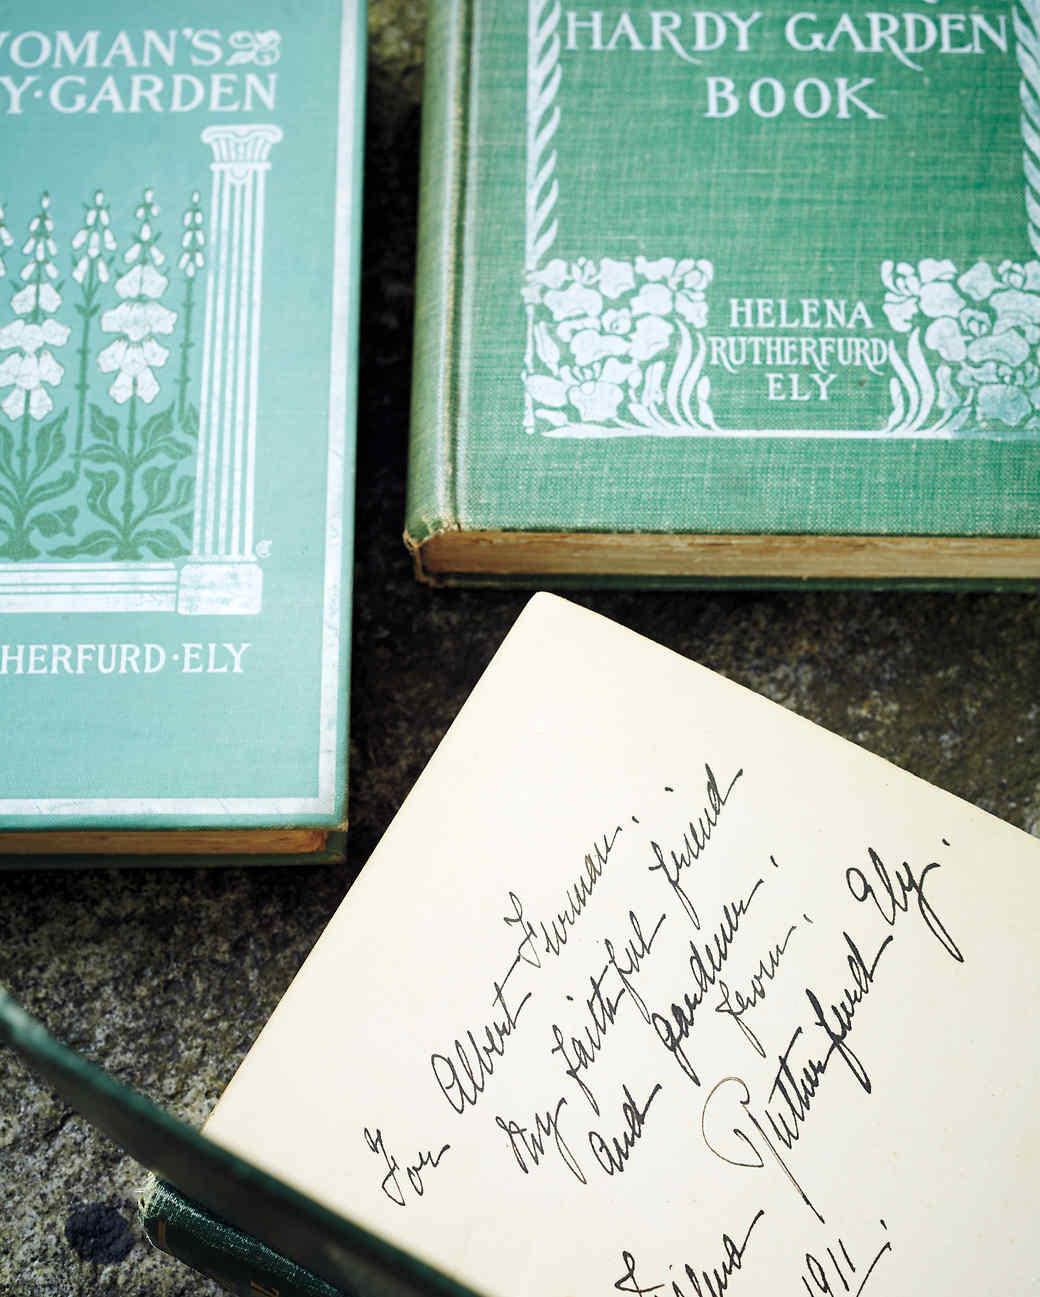 meadowburn-farms-garden-books-236-d111557.jpg